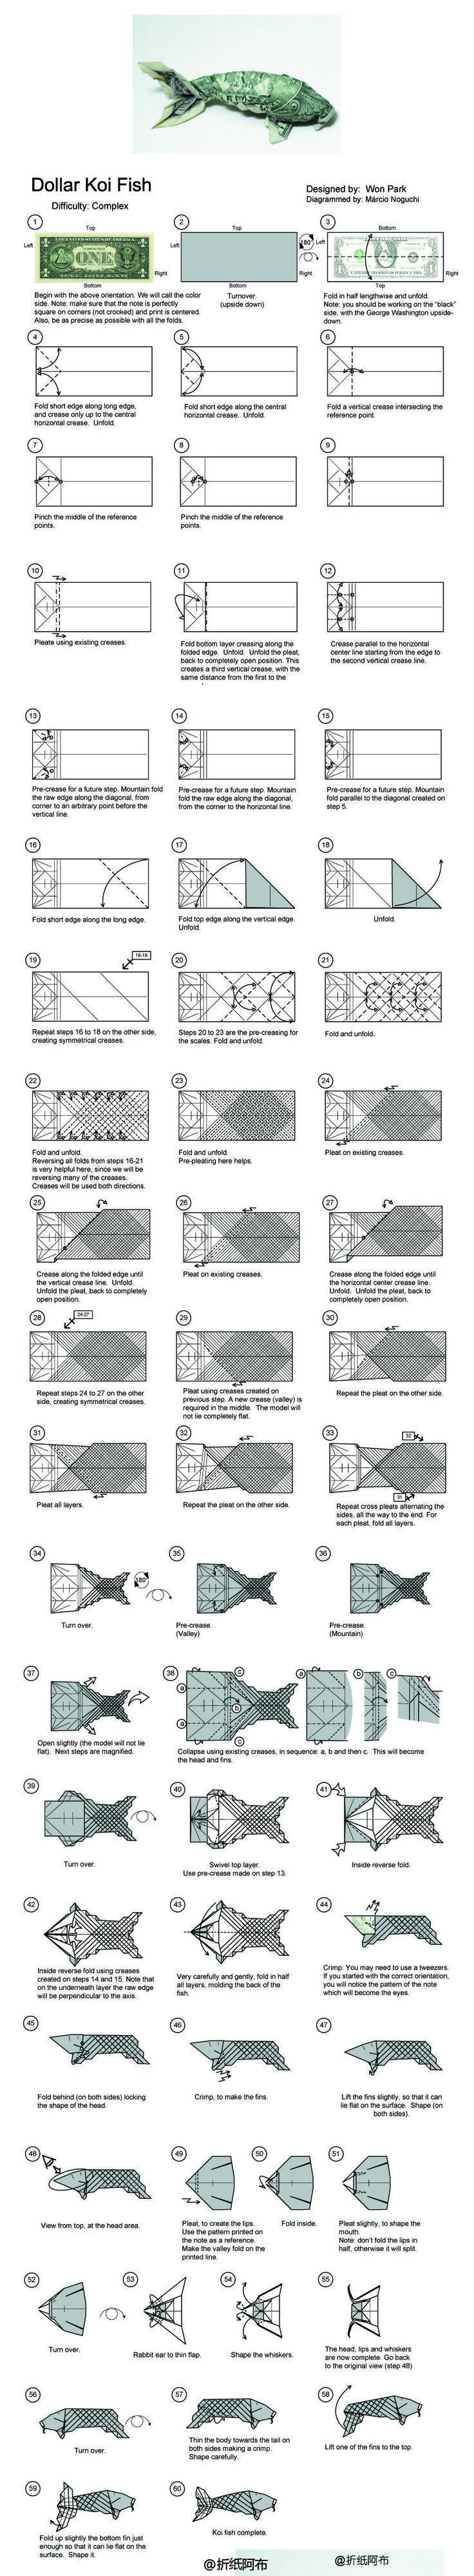 Tutorial: How to make an Origami koi Fish - YouTube | 3996x736